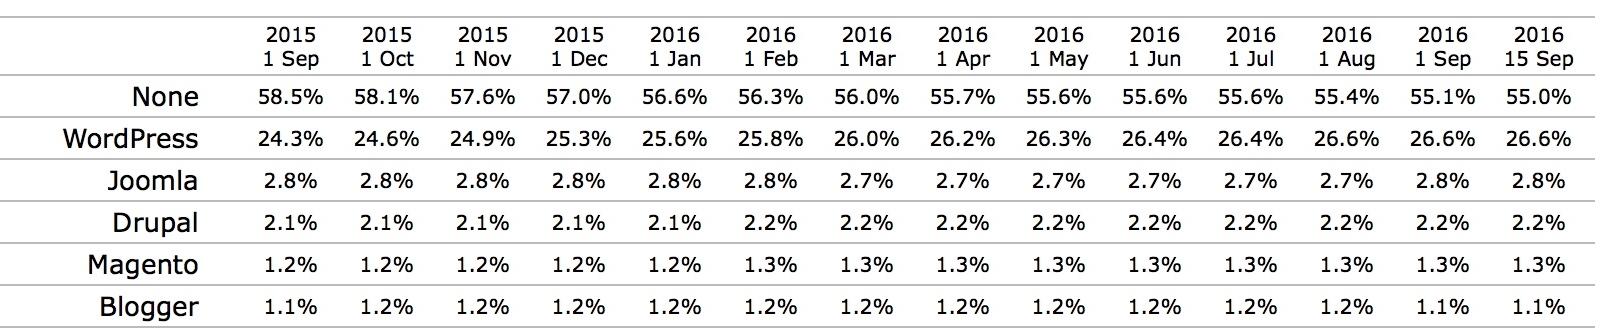 cms-trend-usage